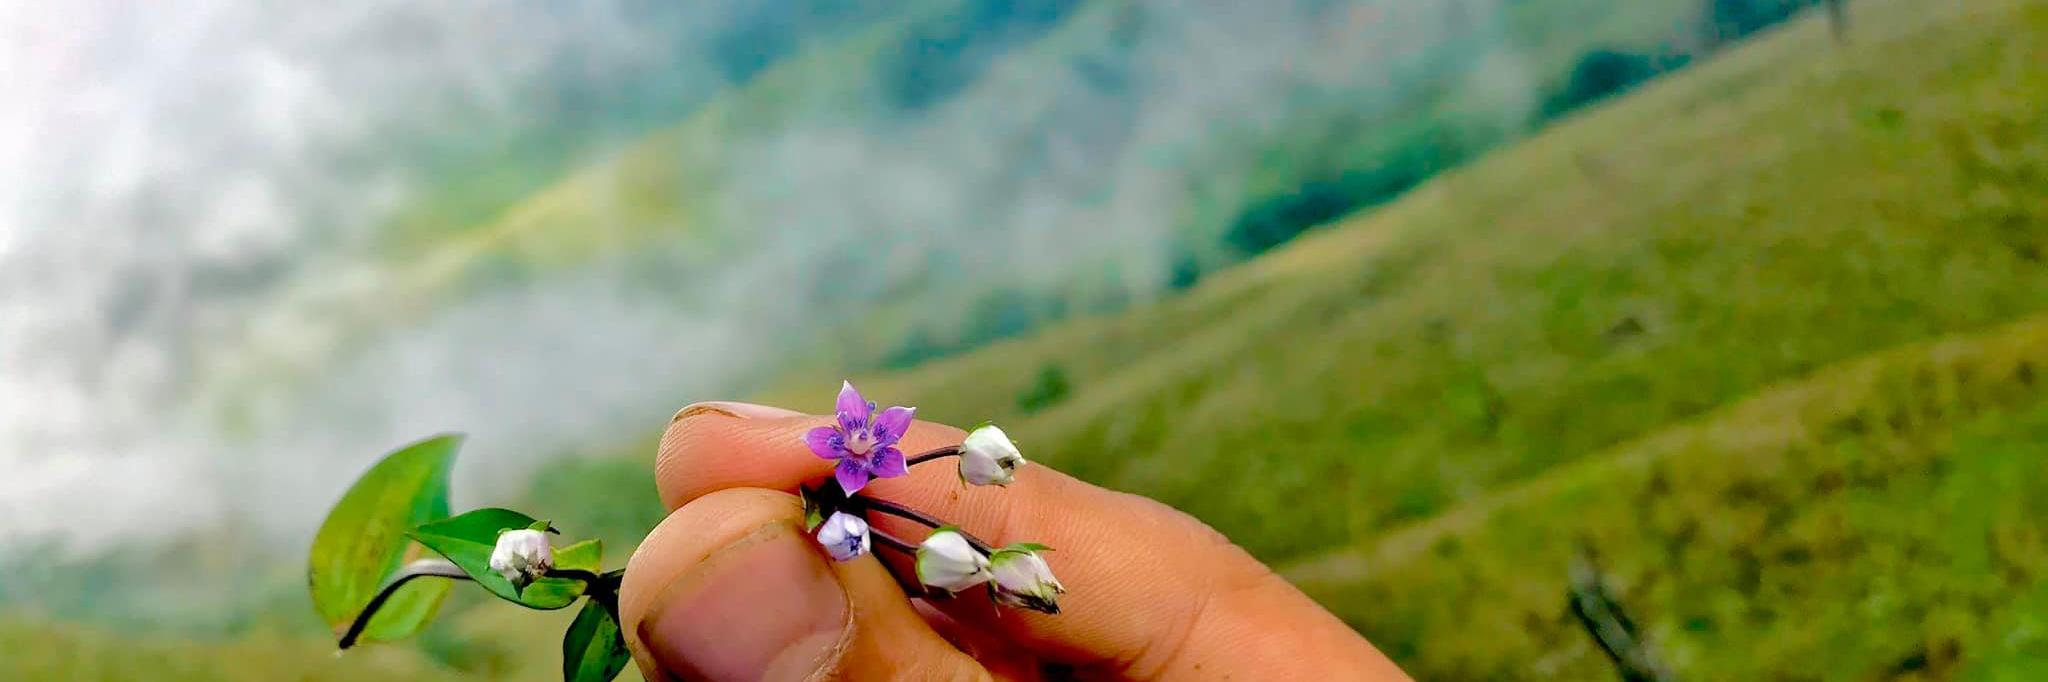 https://gody.vn/blog/thuongbac892402/post/ve-dau-mau-hoa-tim-em-thuong-trekking-dinh-ta-chi-nhu-7573